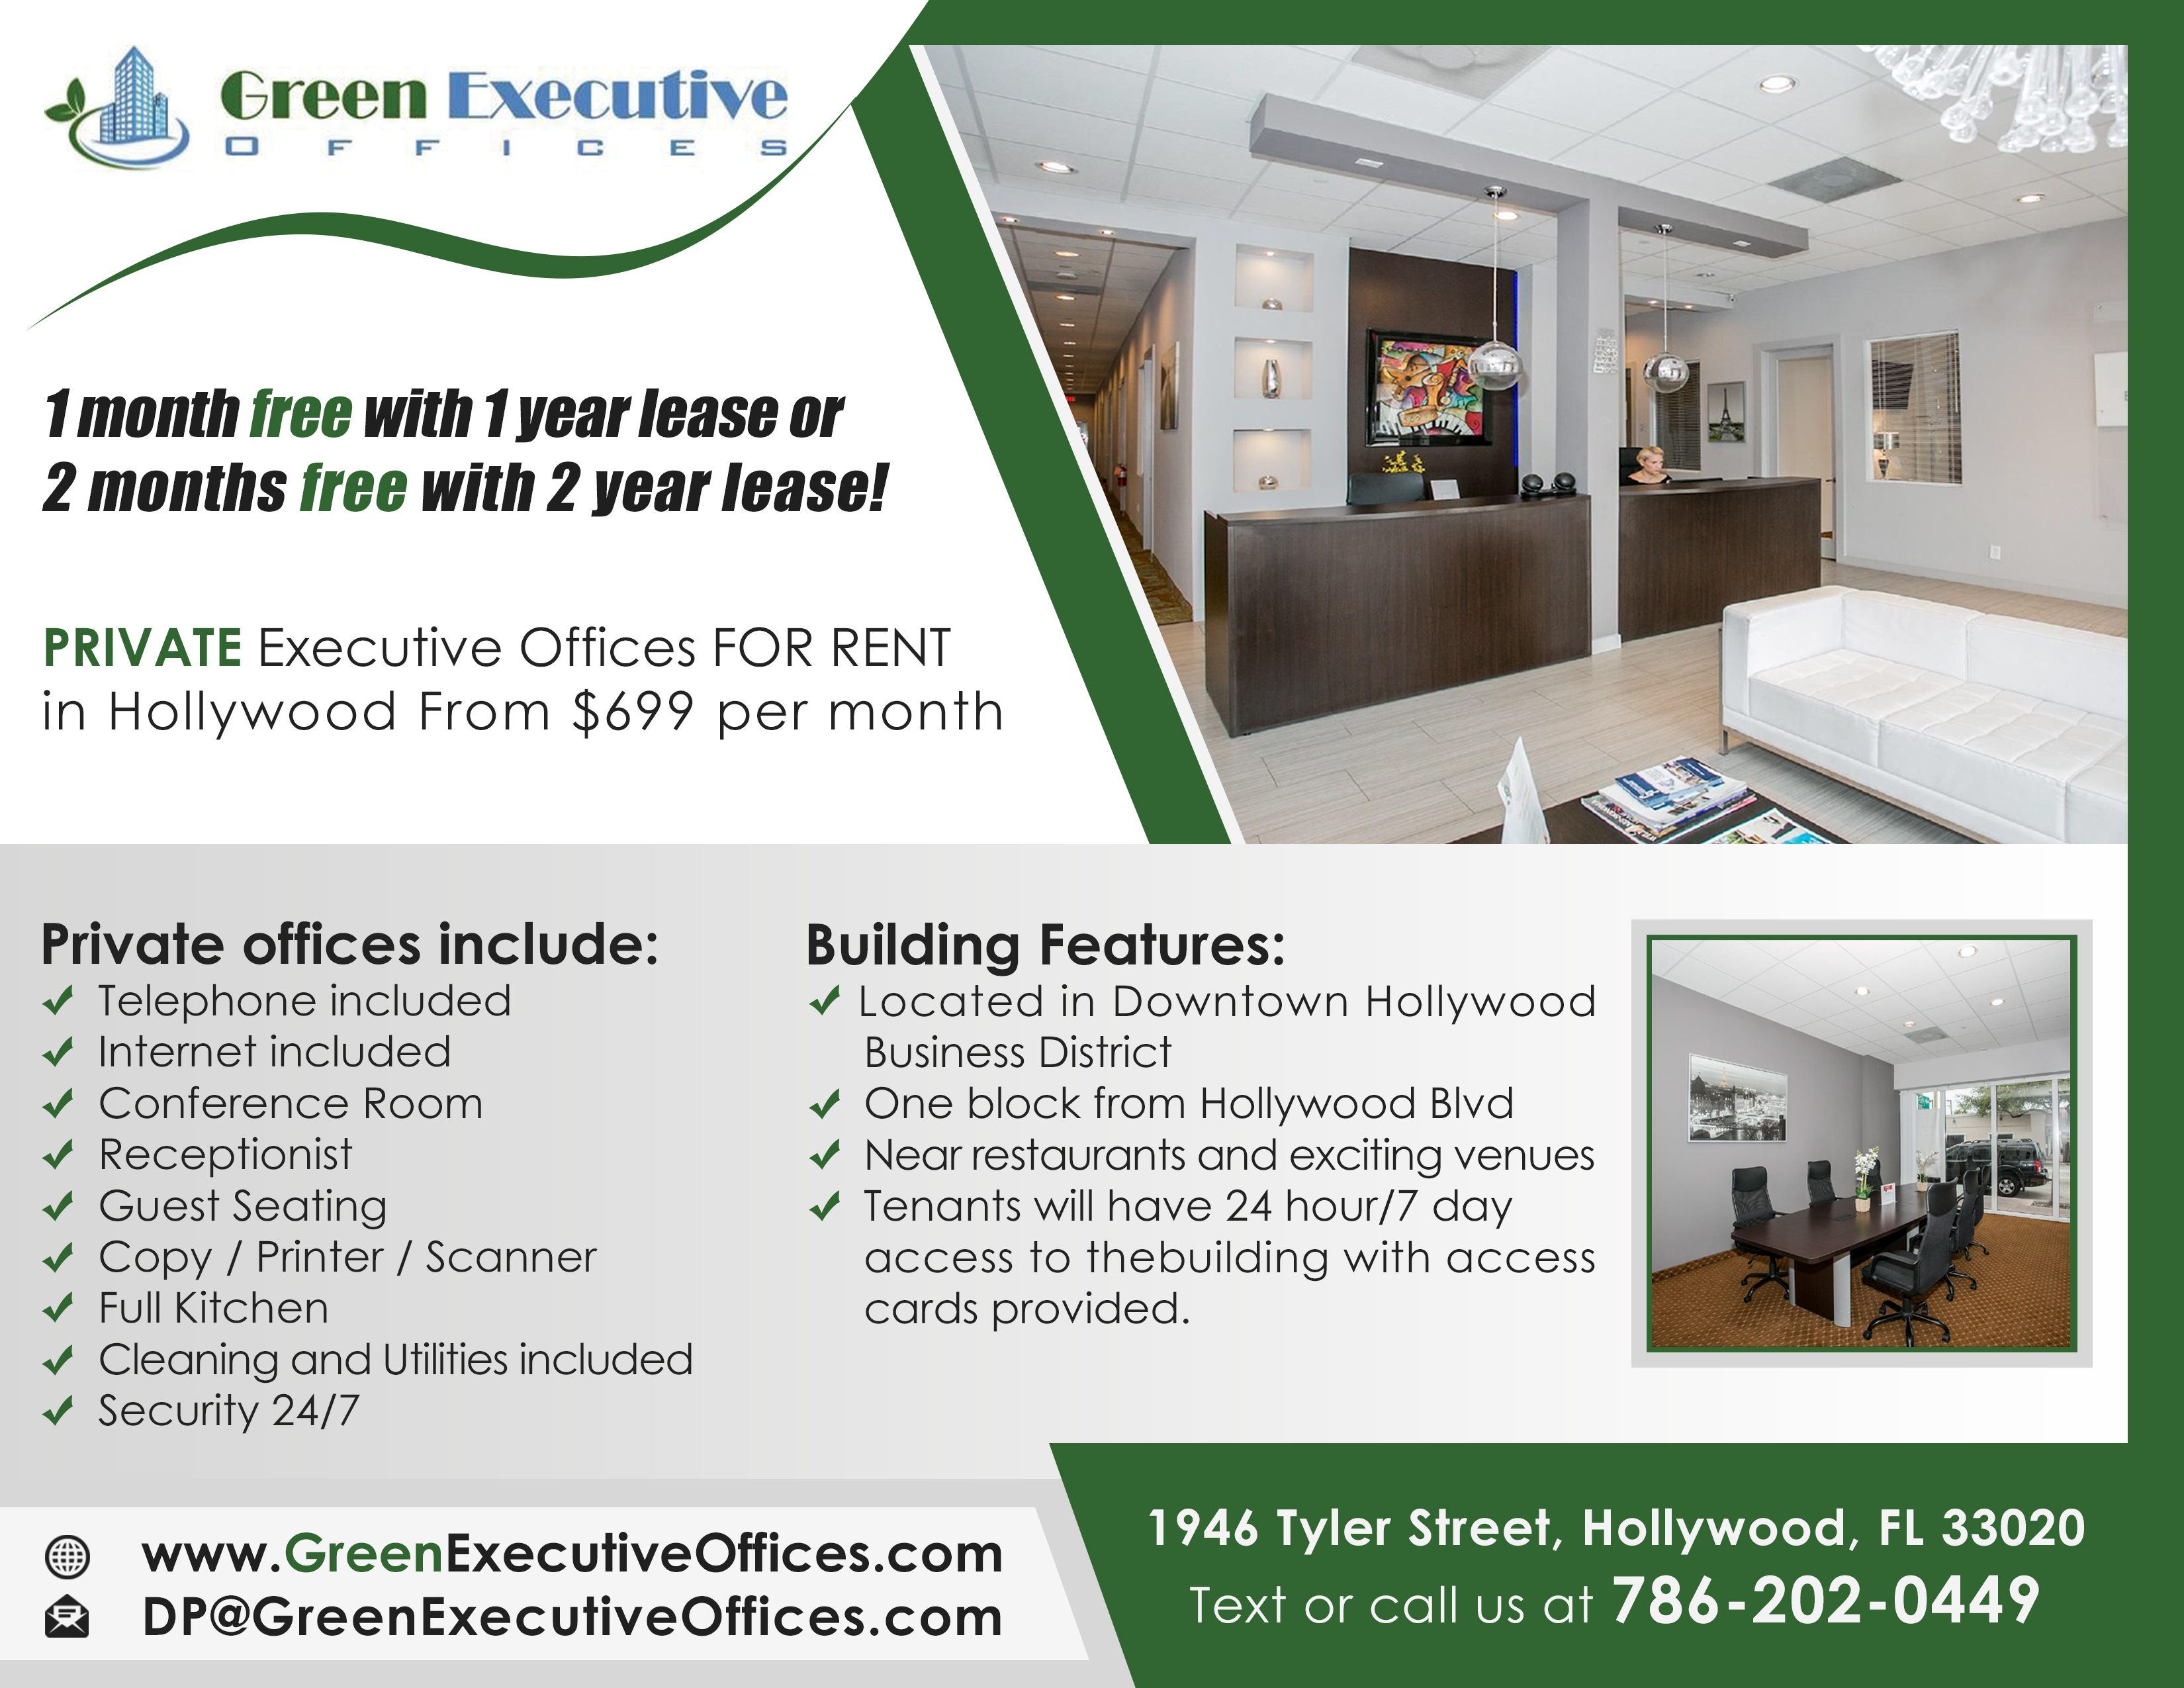 Green Executive Offices